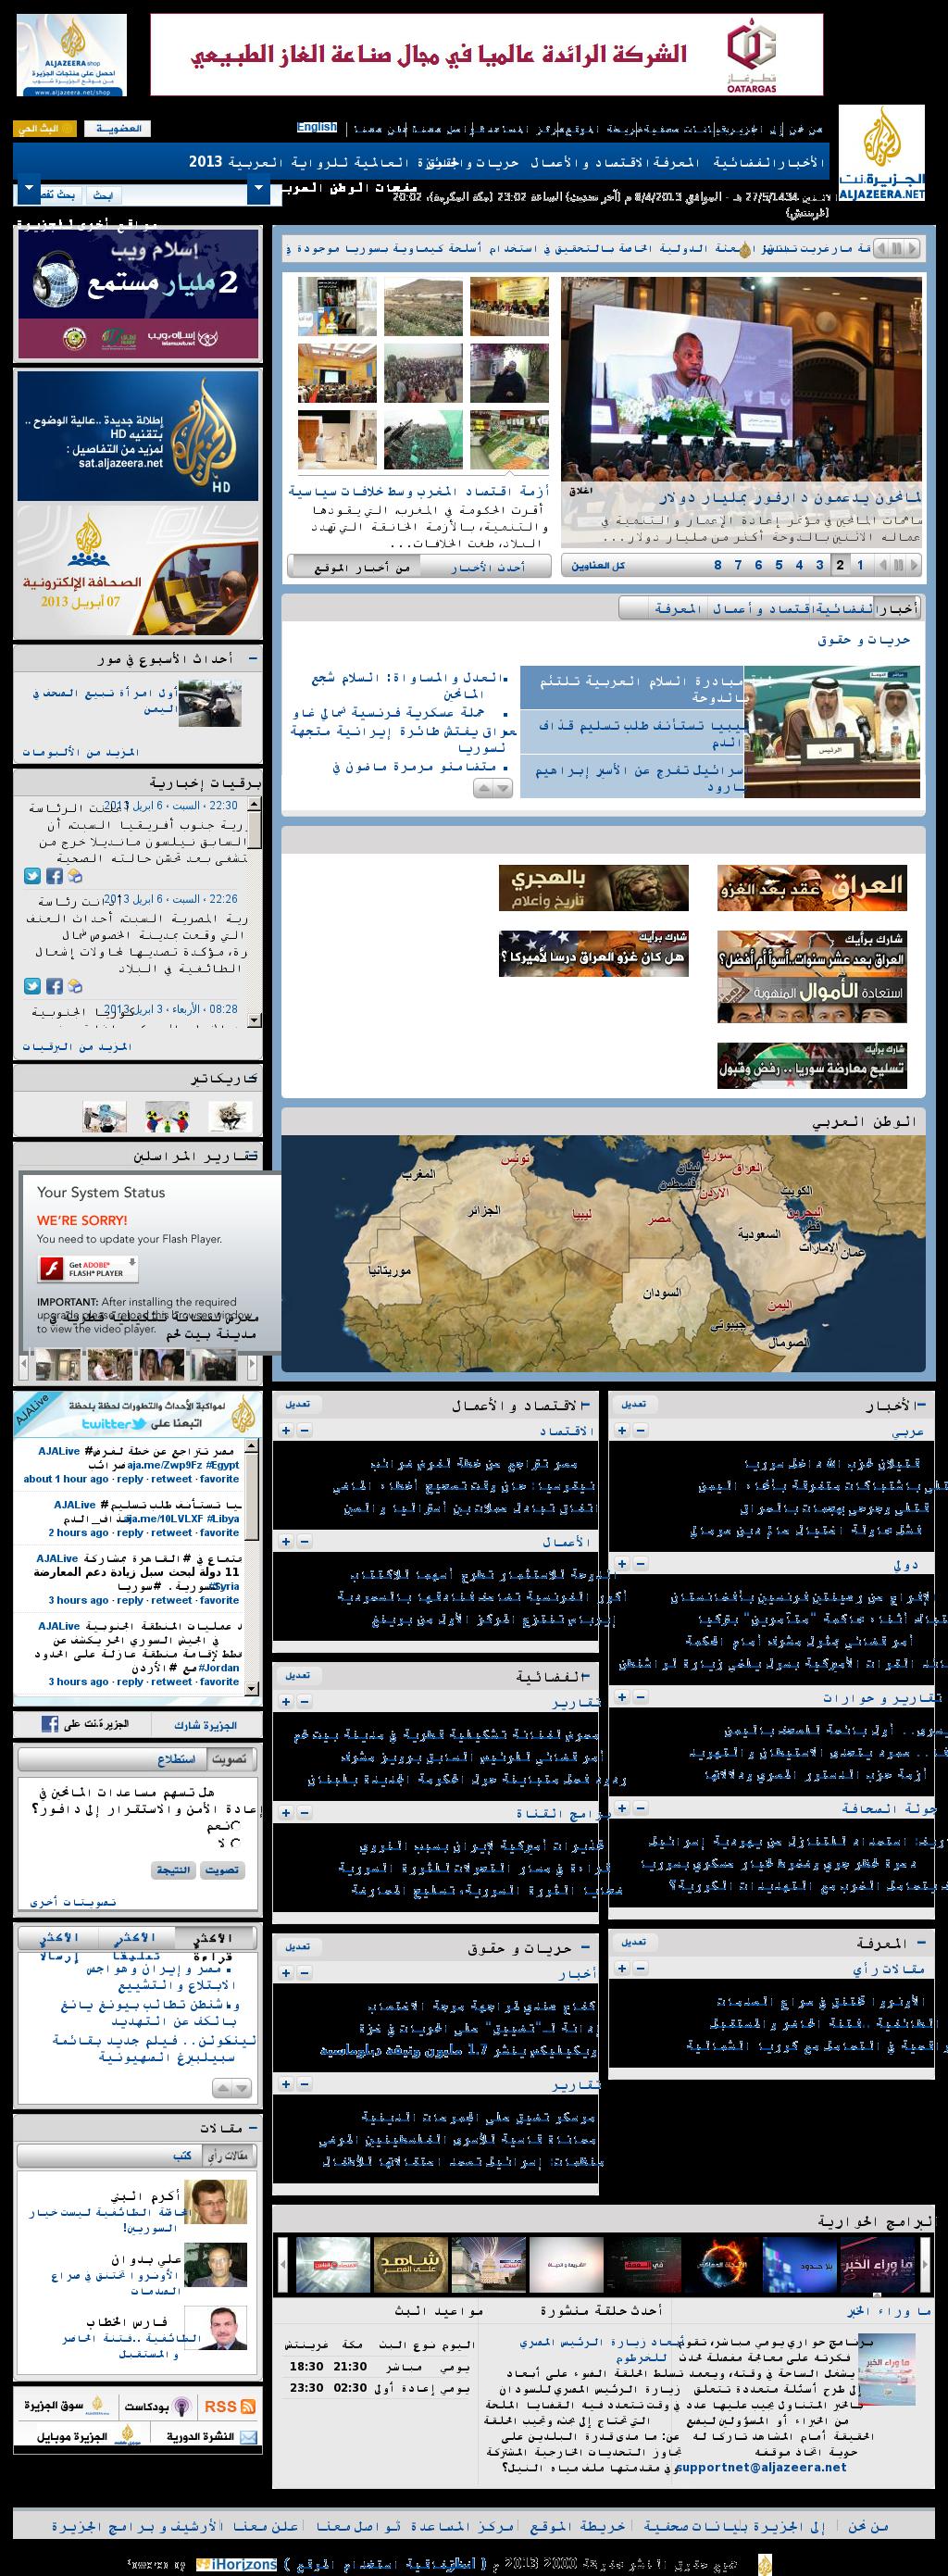 Al Jazeera at Monday April 8, 2013, 9:11 p.m. UTC